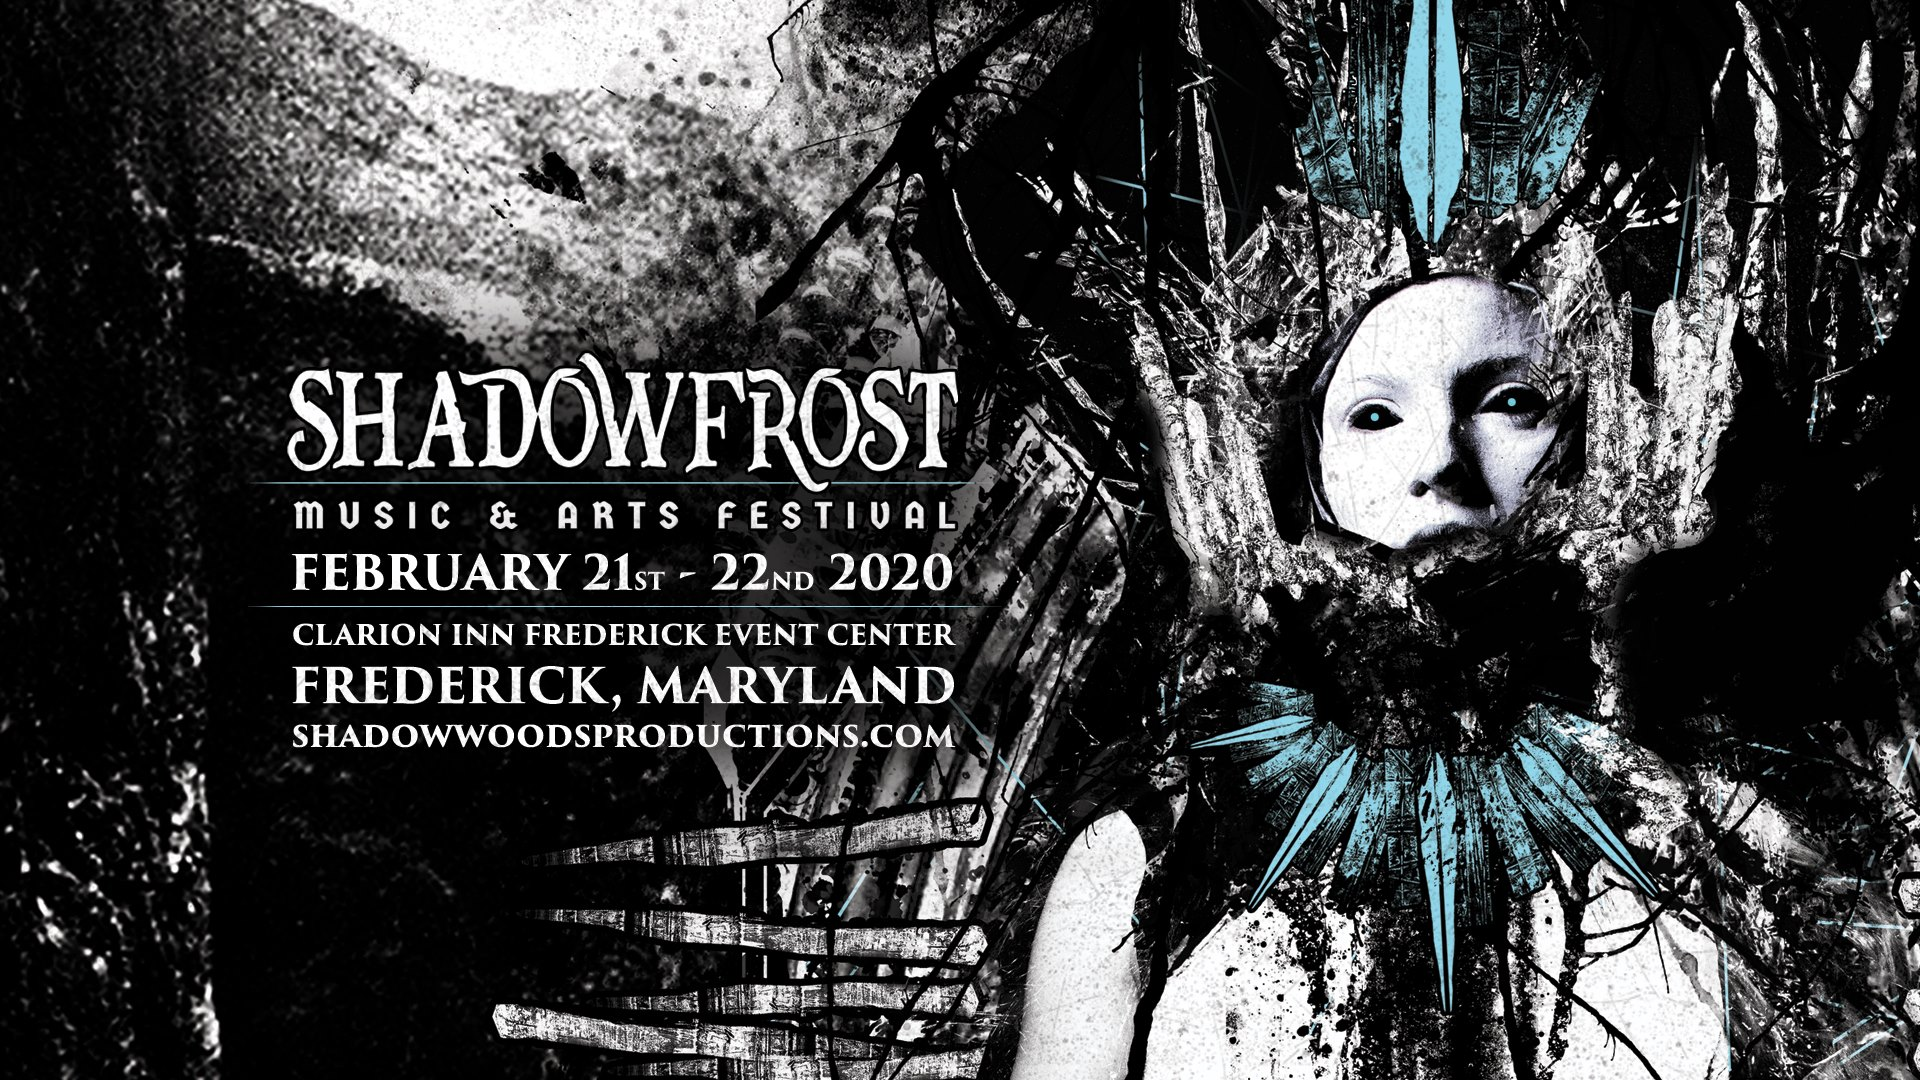 shadowfrost 2020 banner